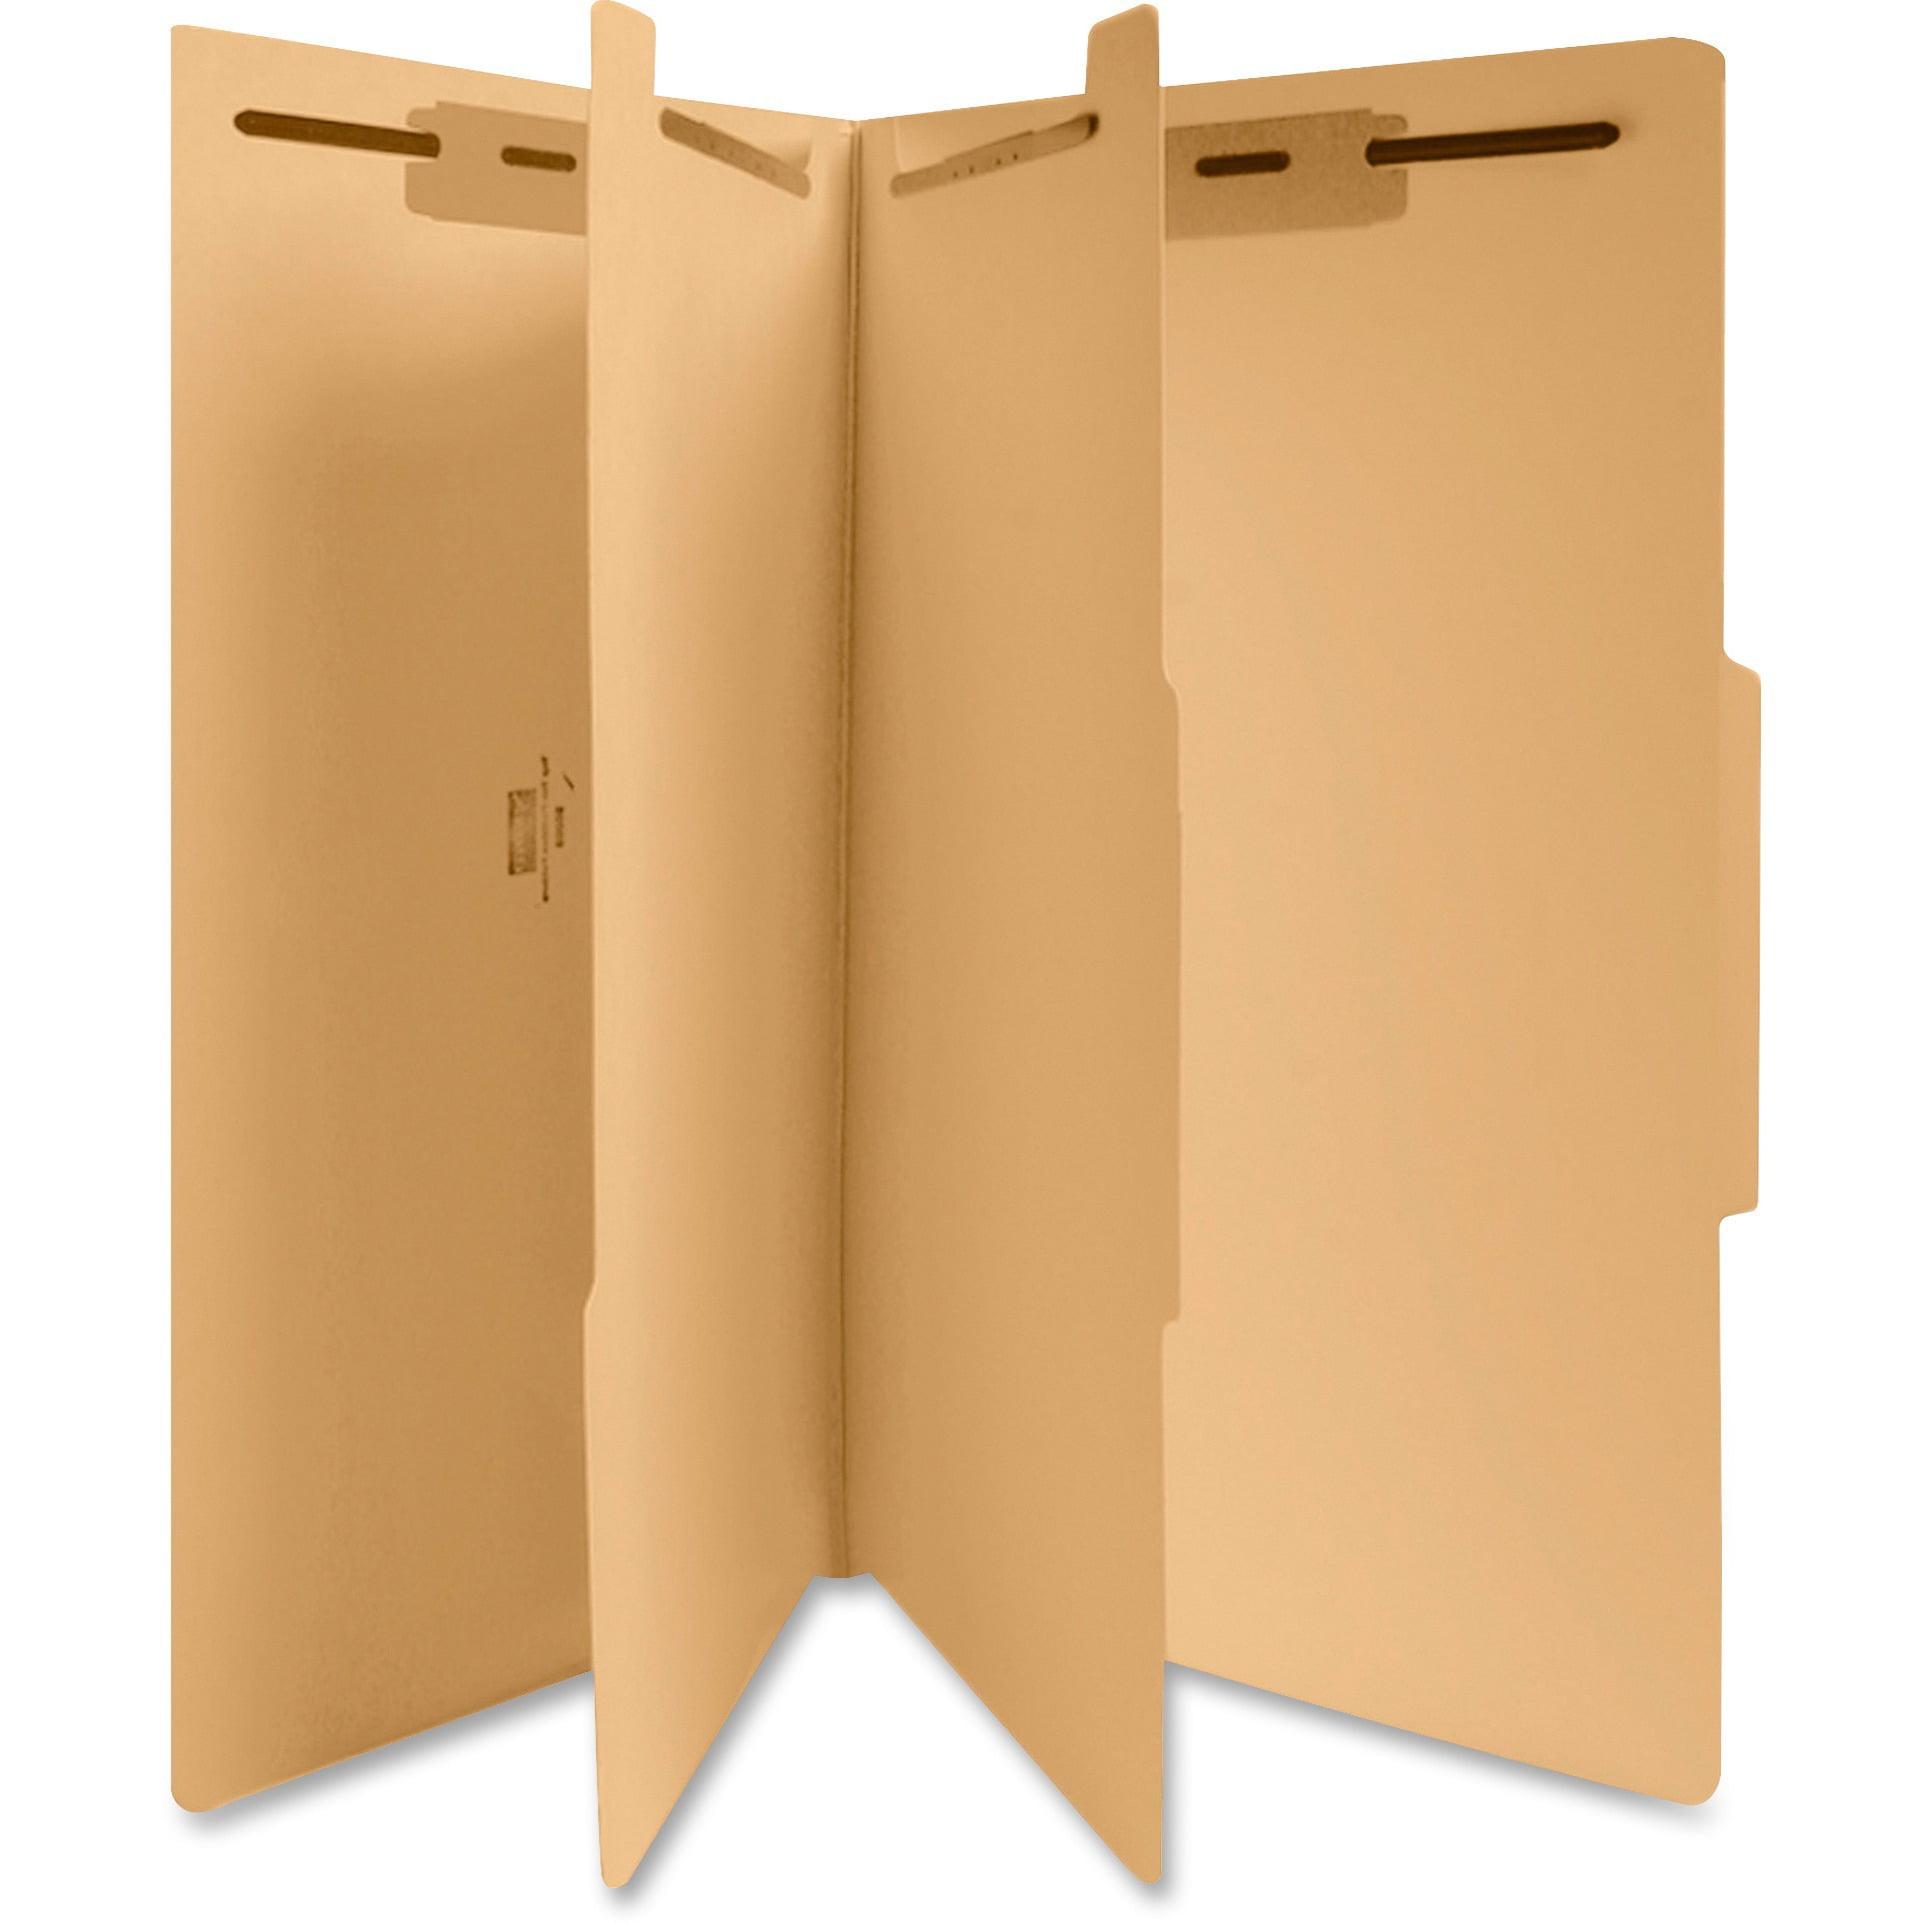 Business Source, BSN95008, 6-Part Manila Classification Folders, 25 / Box